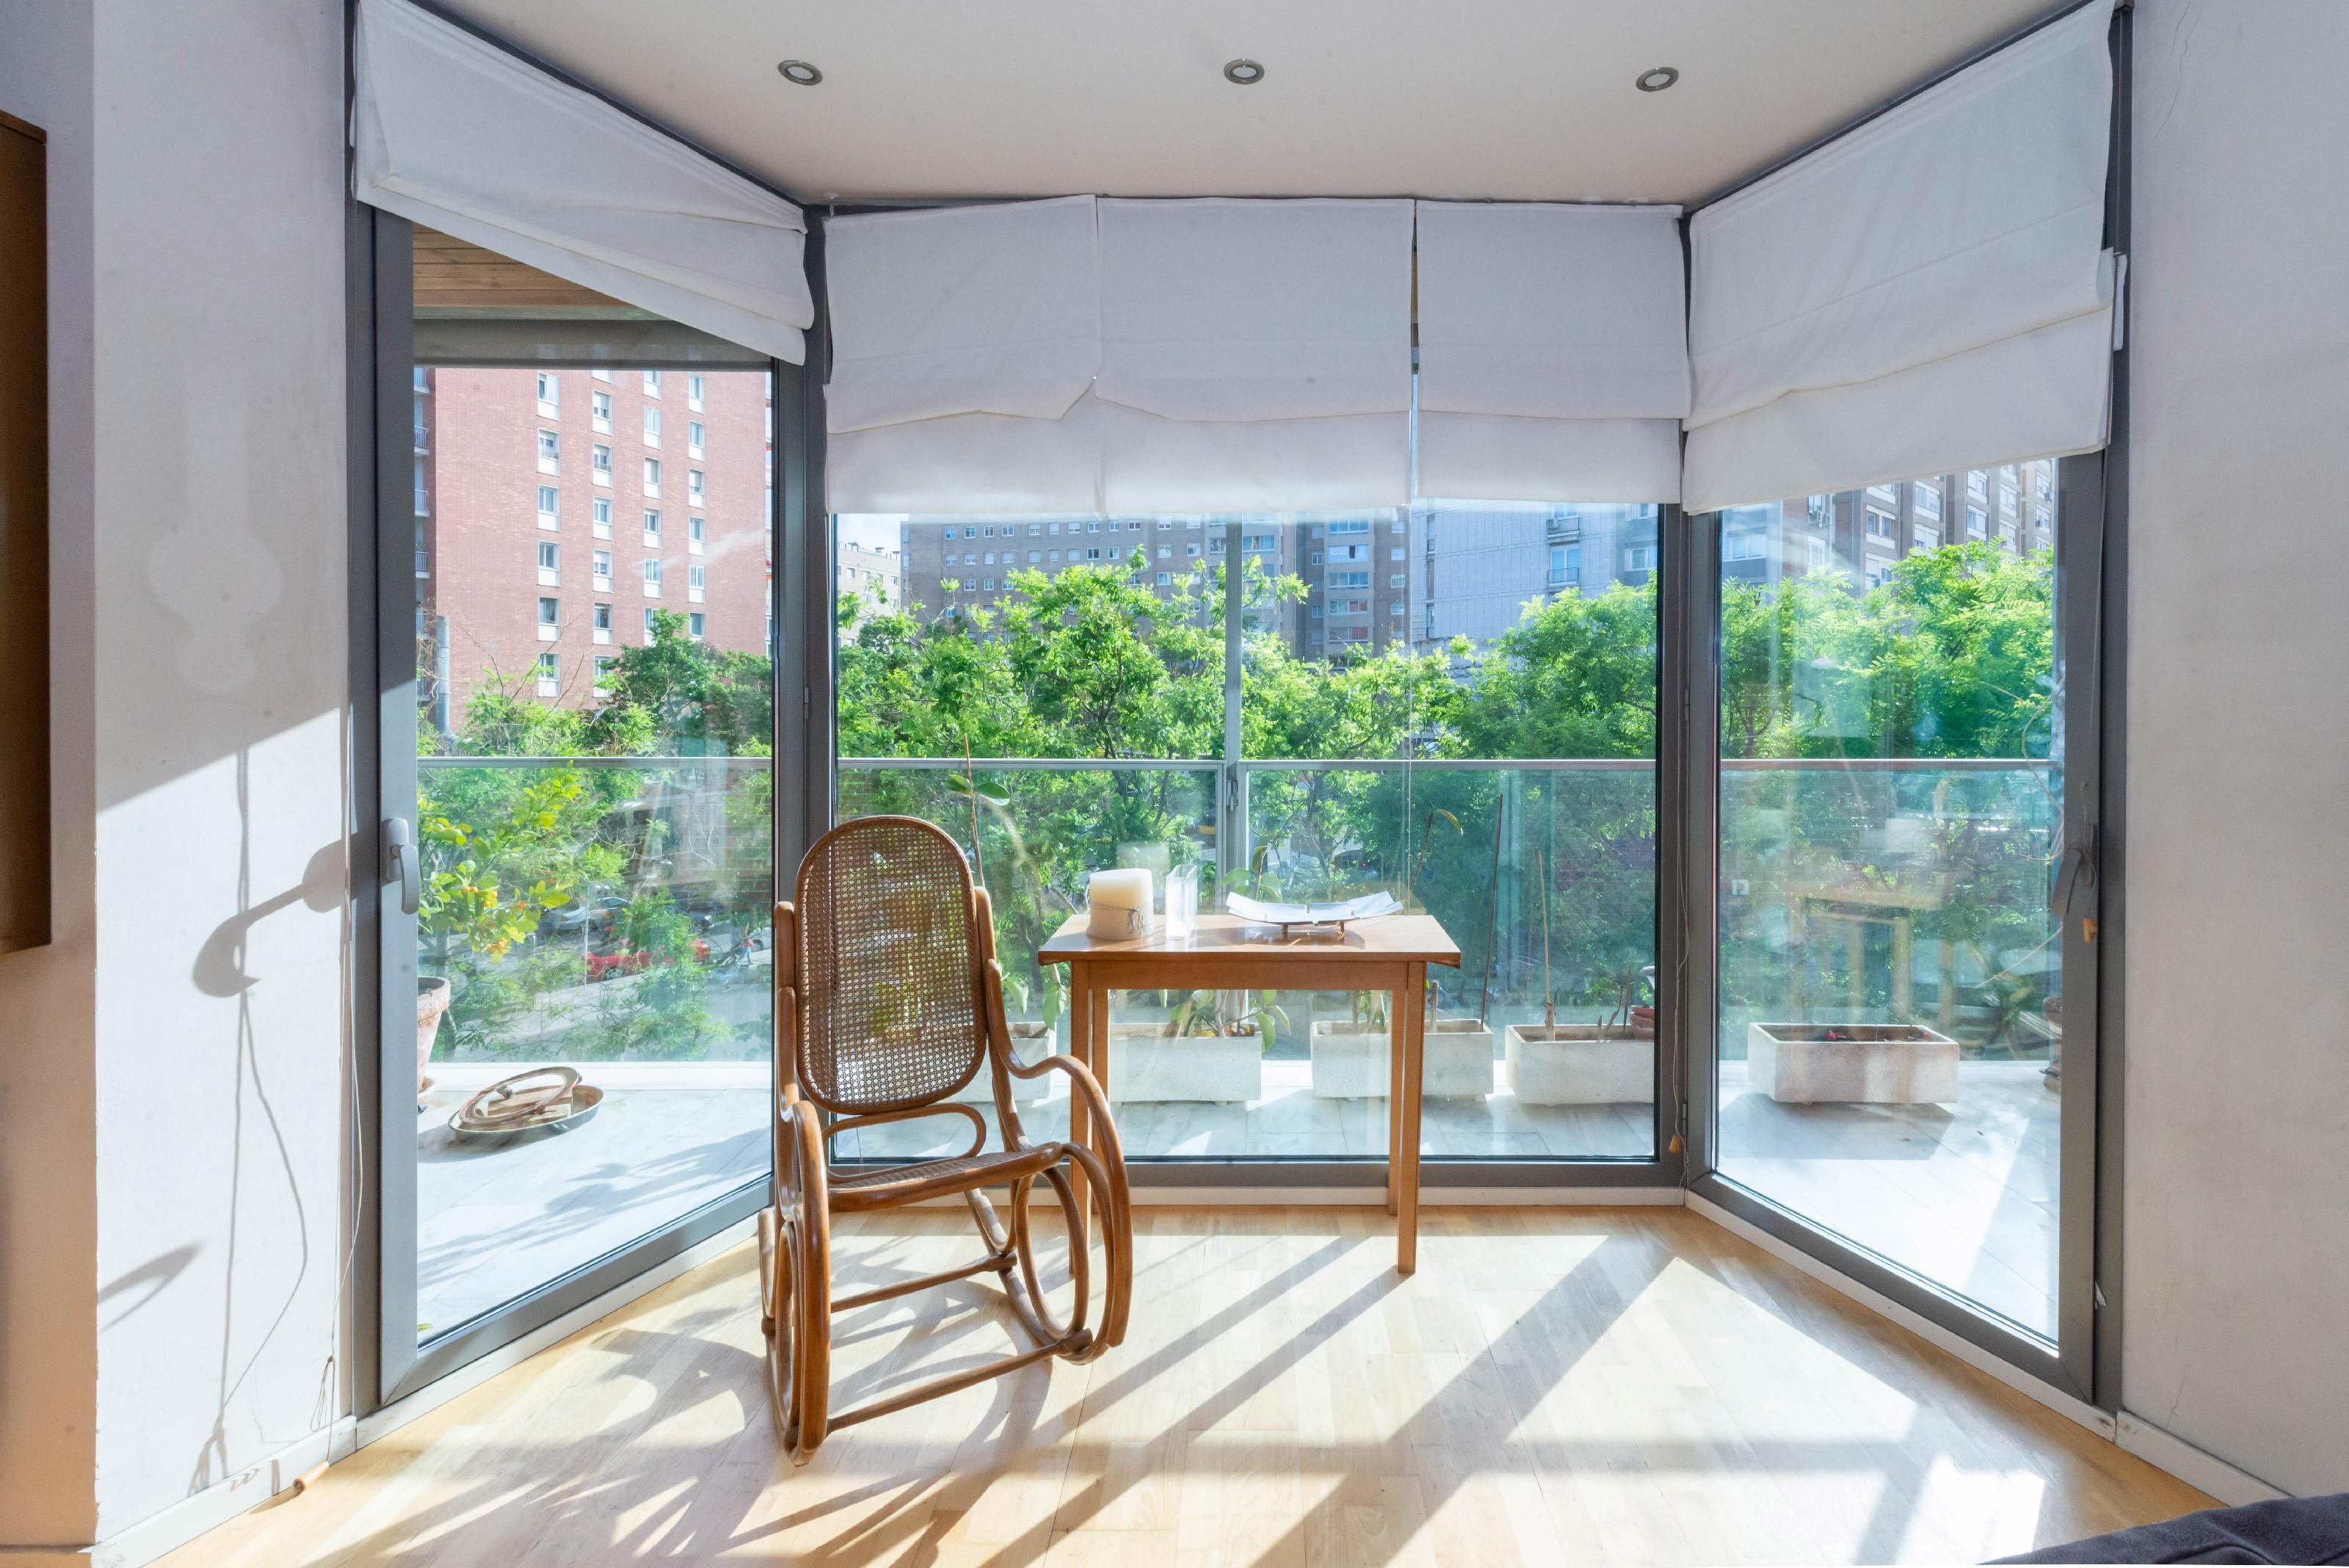 246281 Flat for sale in Sarrià-Sant Gervasi, Tres Torres 1